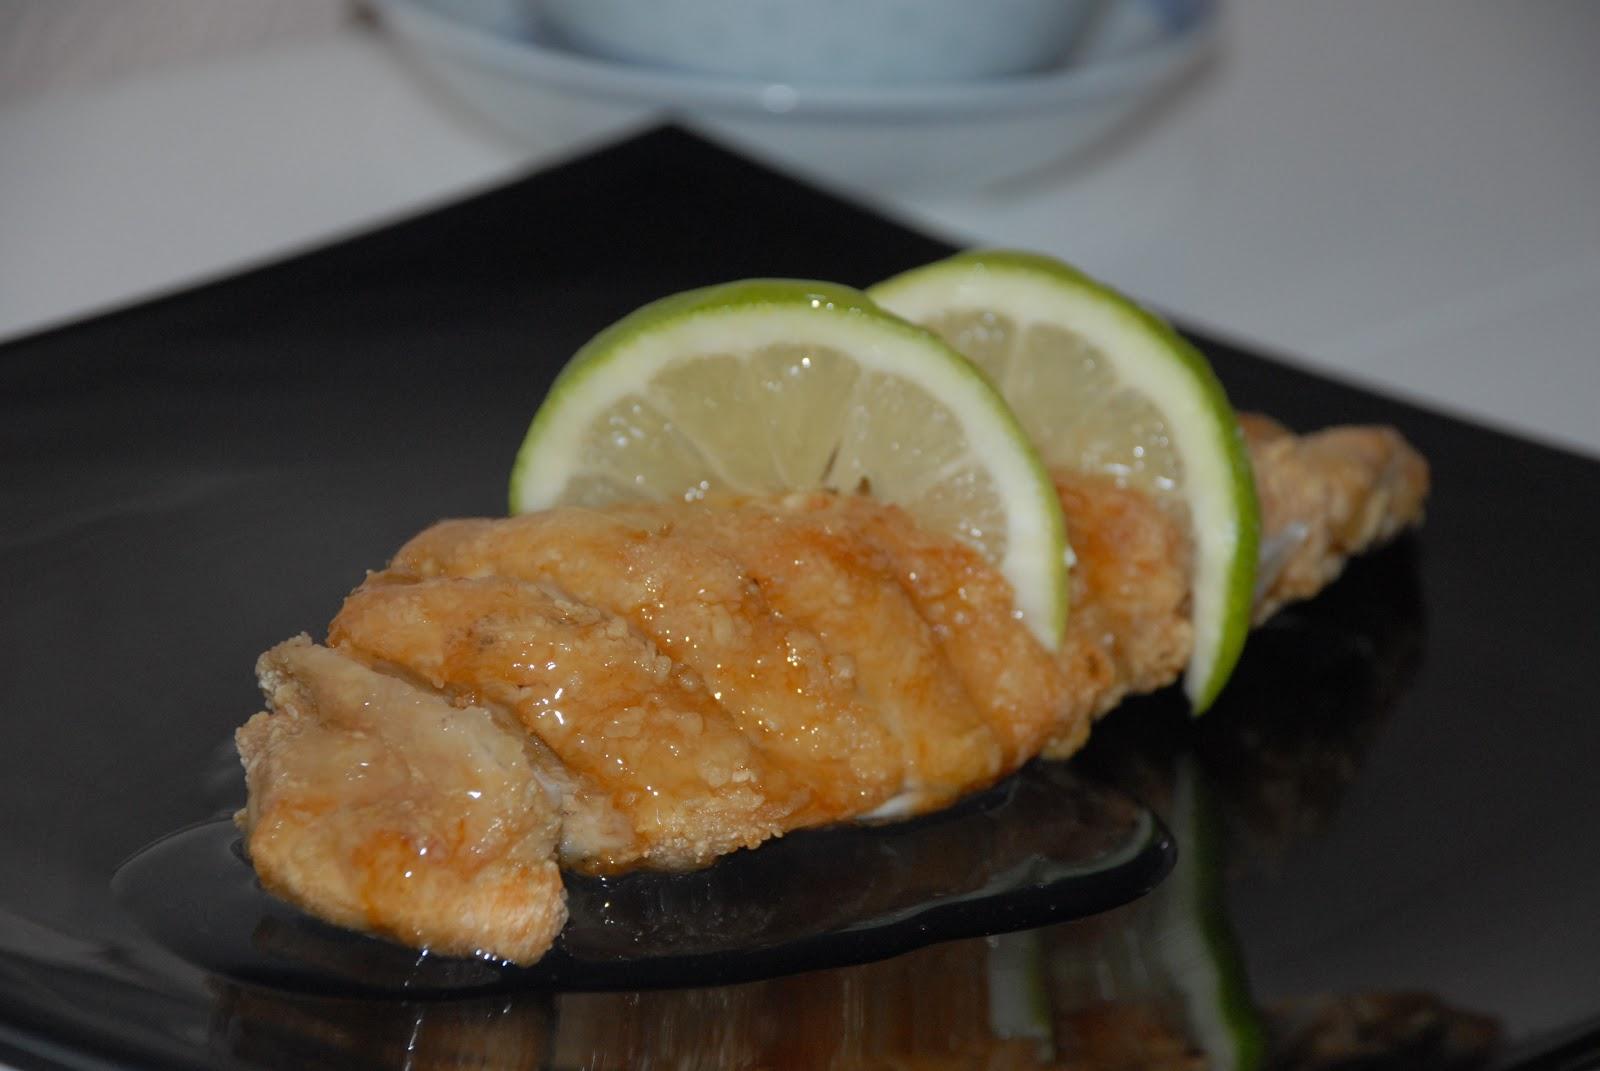 Las hadas en la cocina pechuga de pollo al lim n - Pechugas de pollo al limon ...